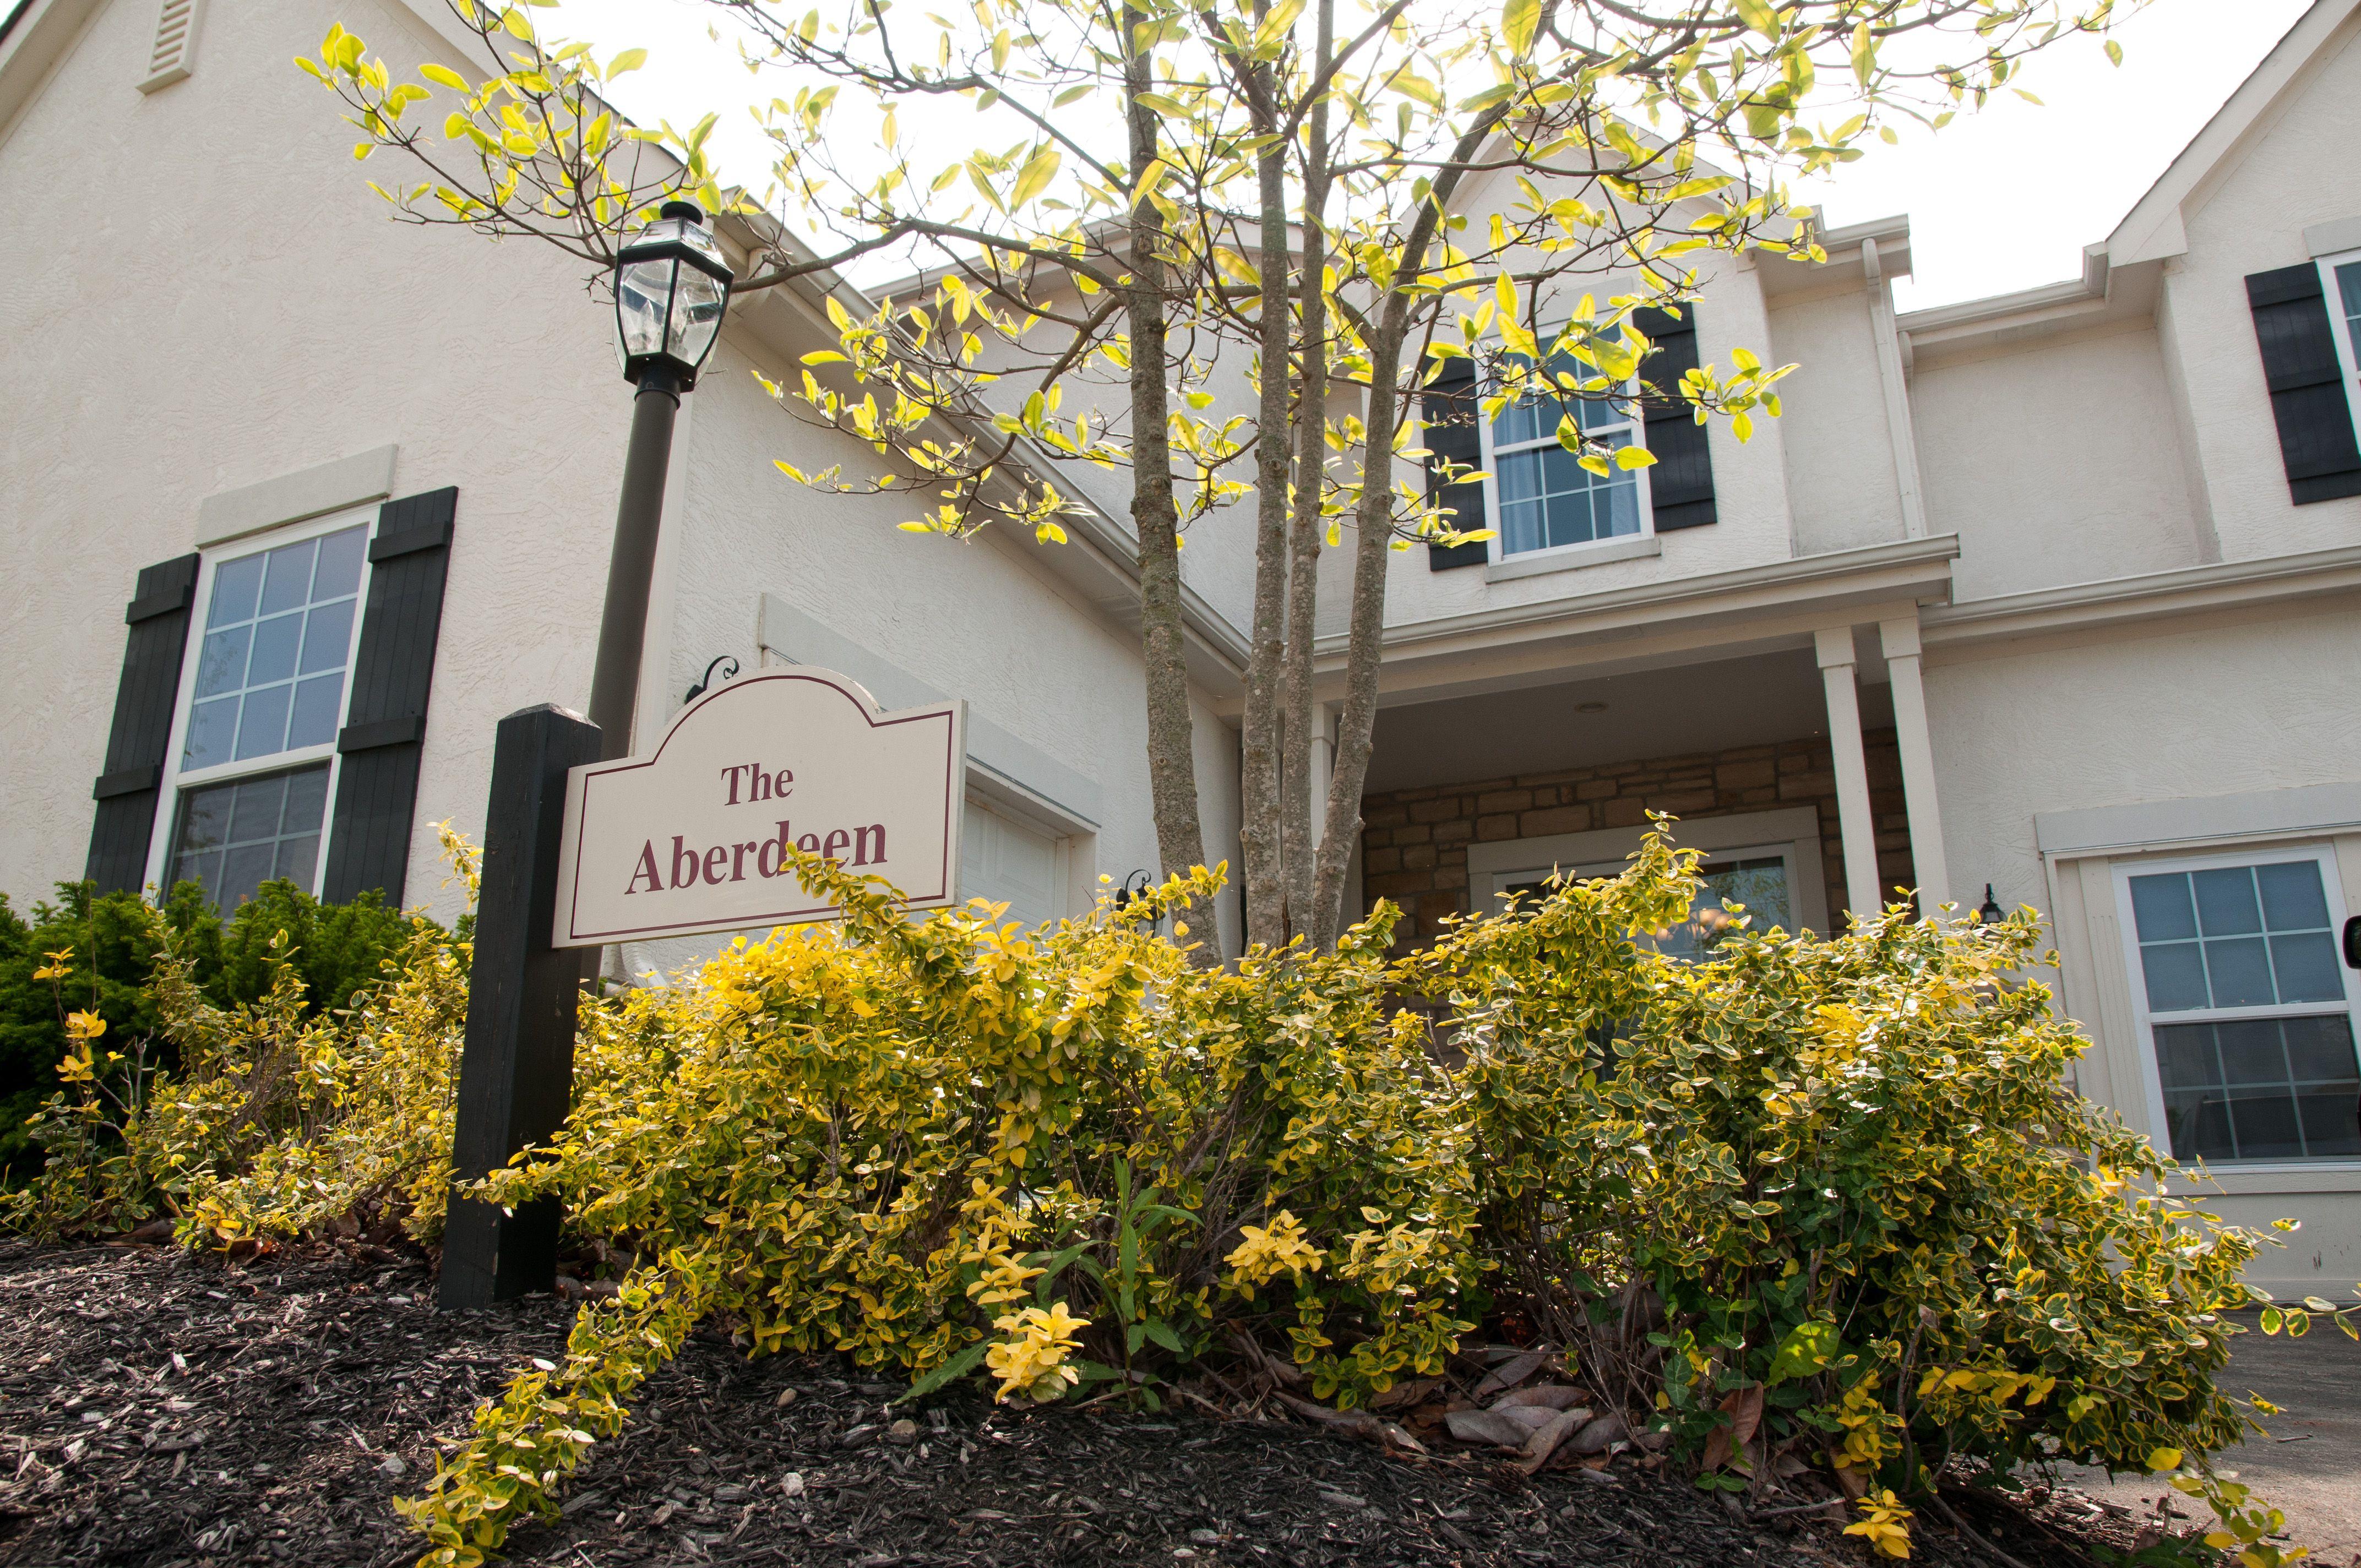 Aberdeen Multi Family Homes For Sale Columbus Ohio Trinity Homes Multi Family Homes House Floor Plans